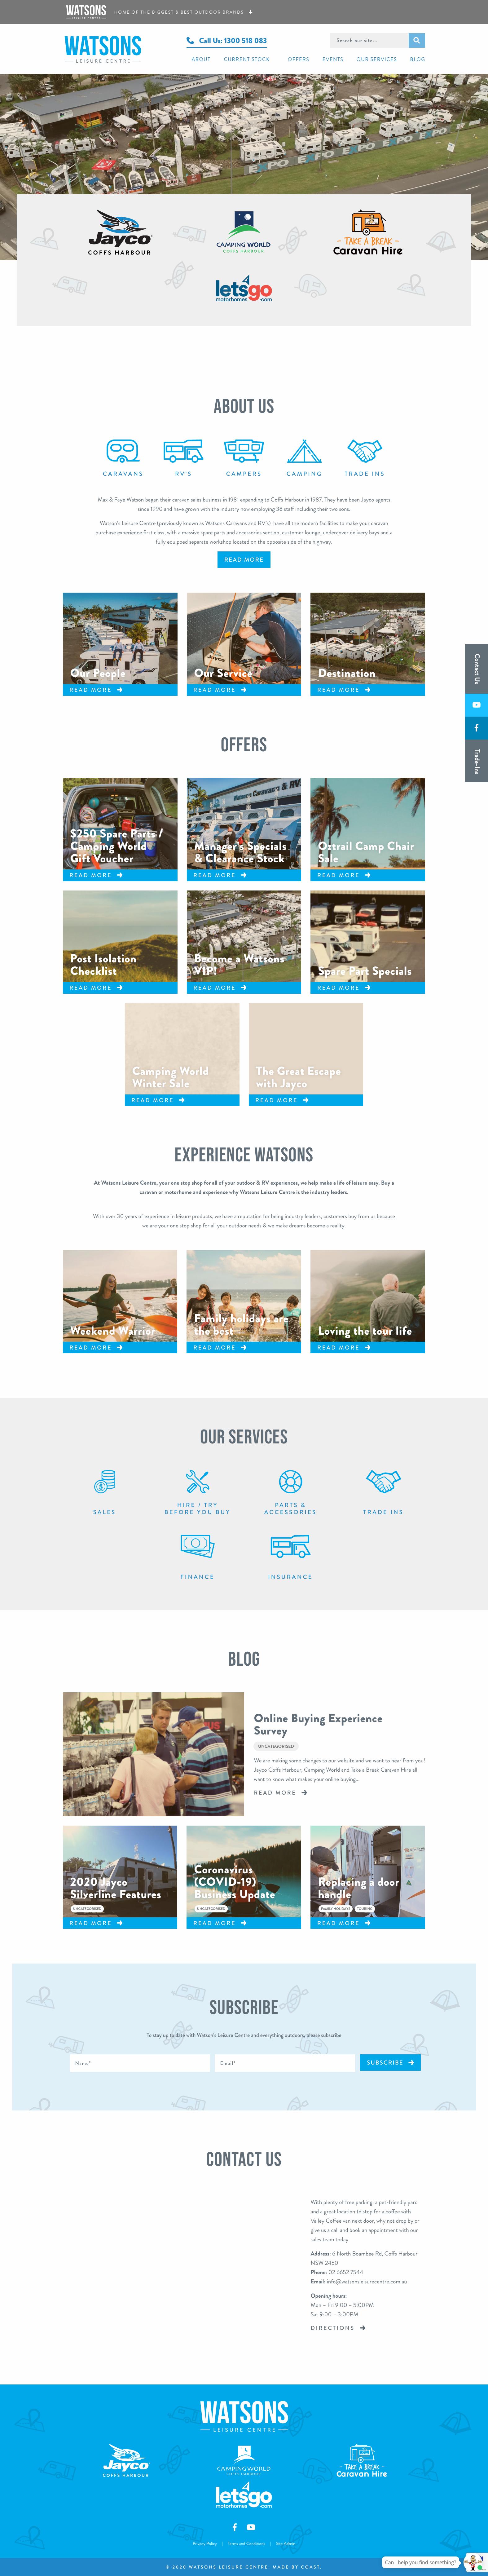 Website Design & Development for Watsons Leisure Centre